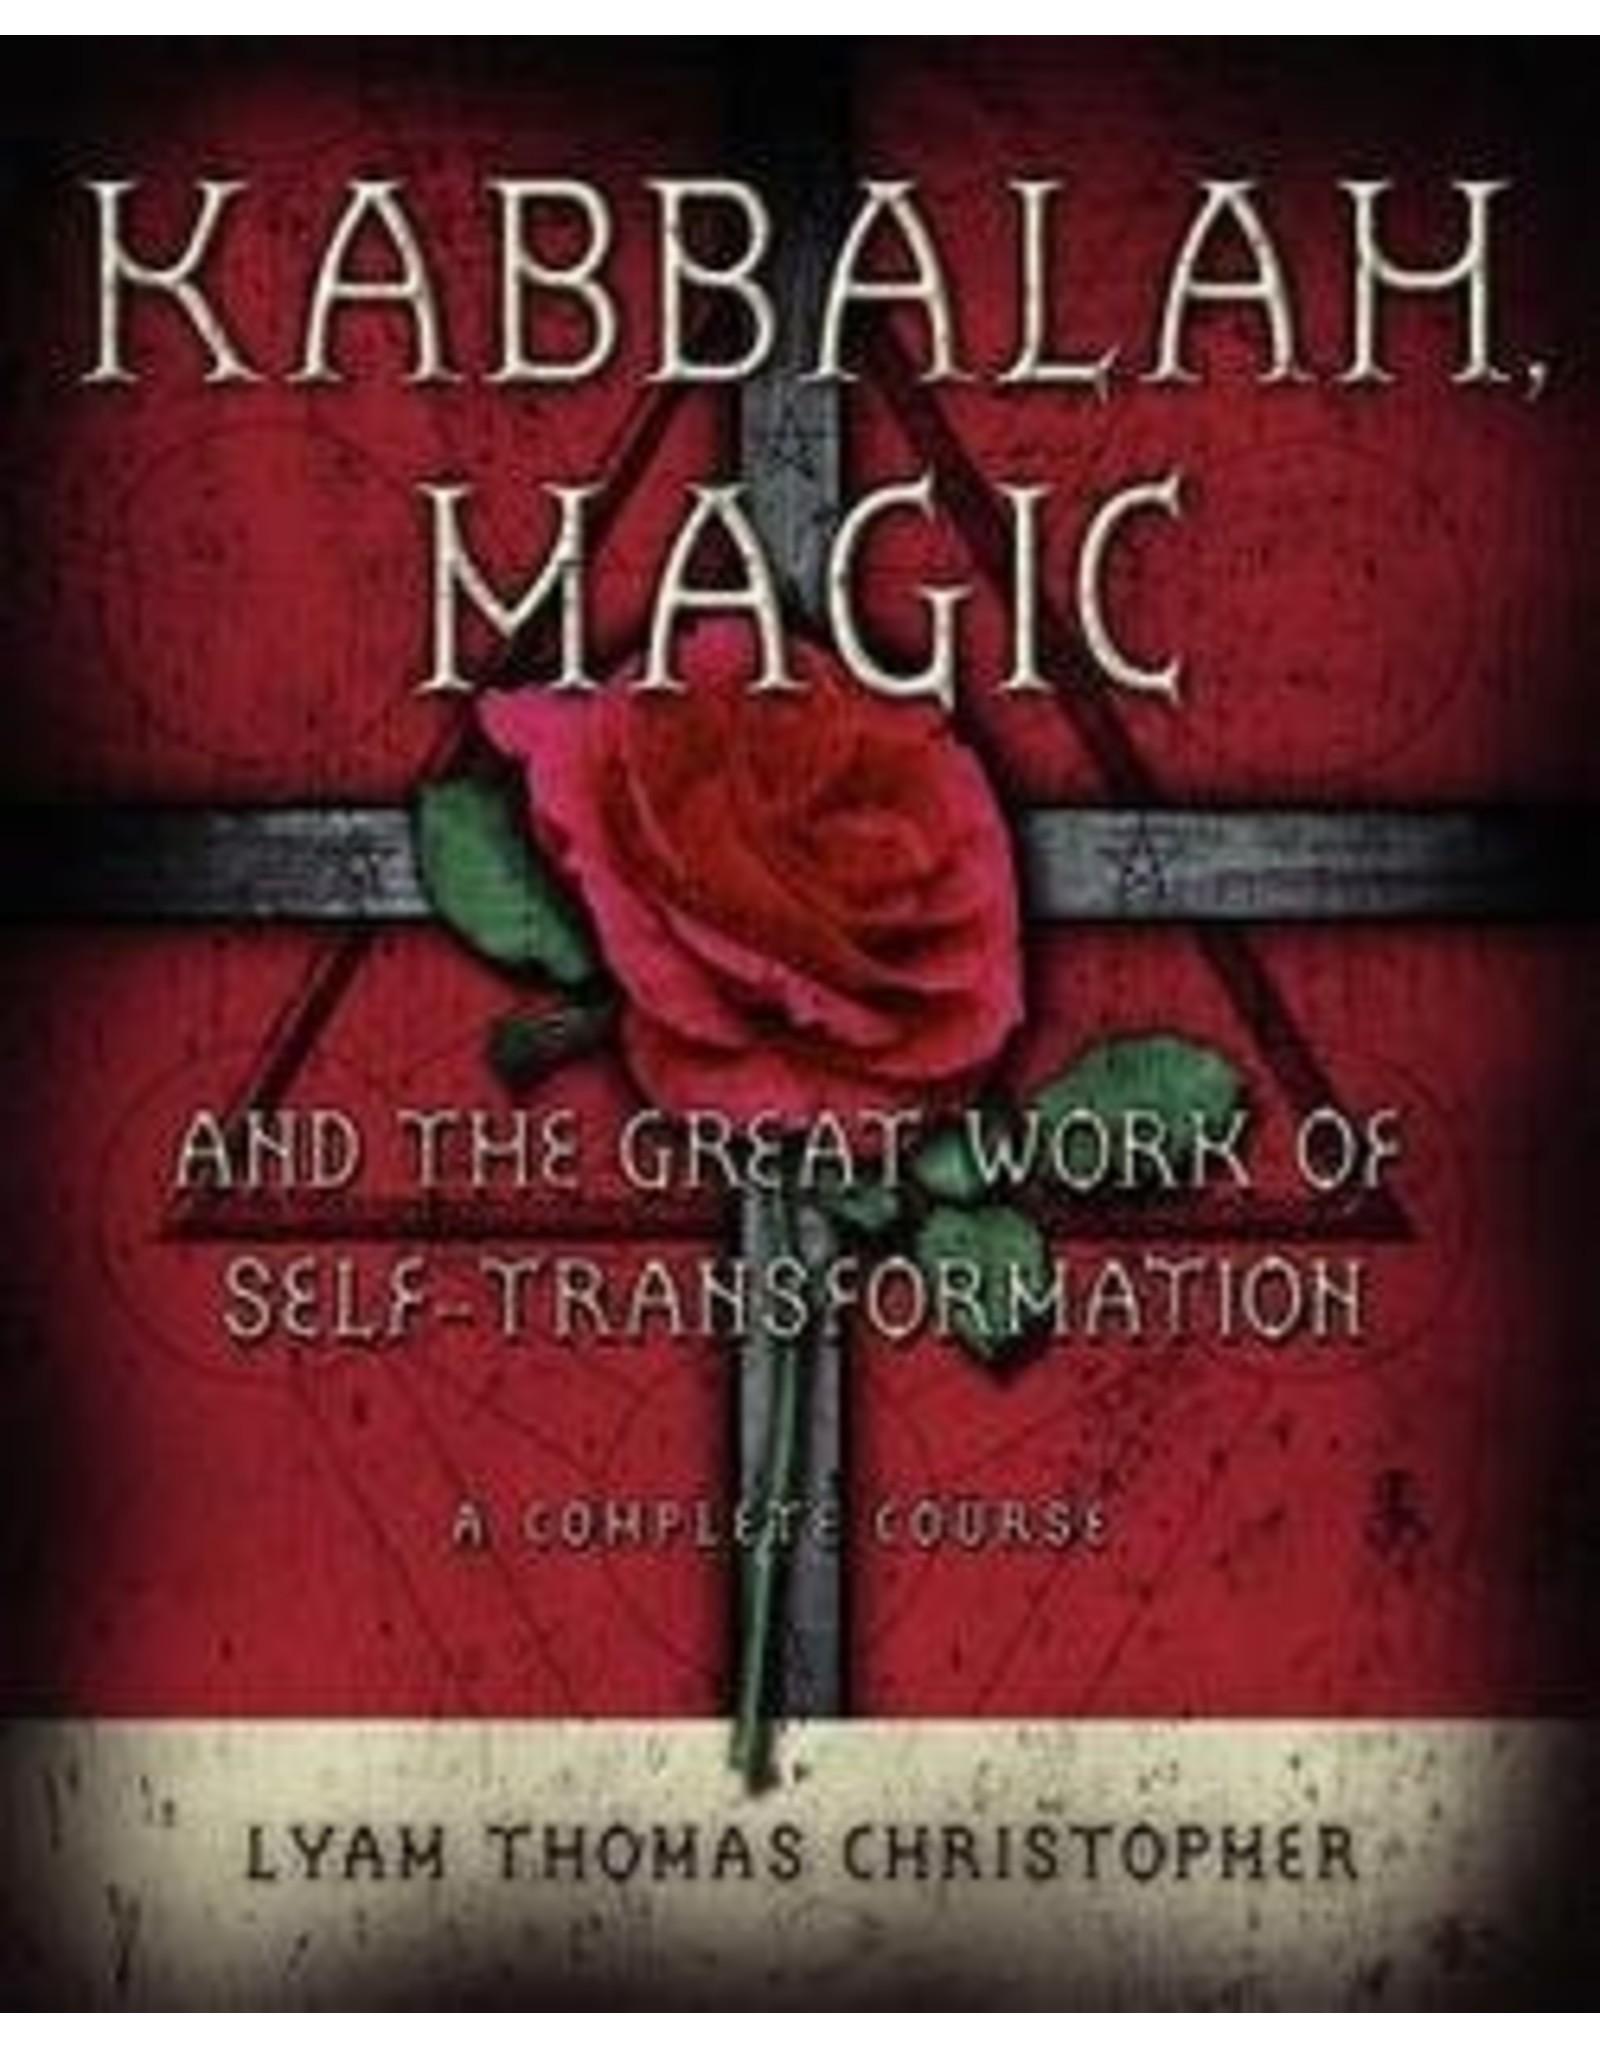 Kabbalah Magic: And the Great Work of Self-Transformation